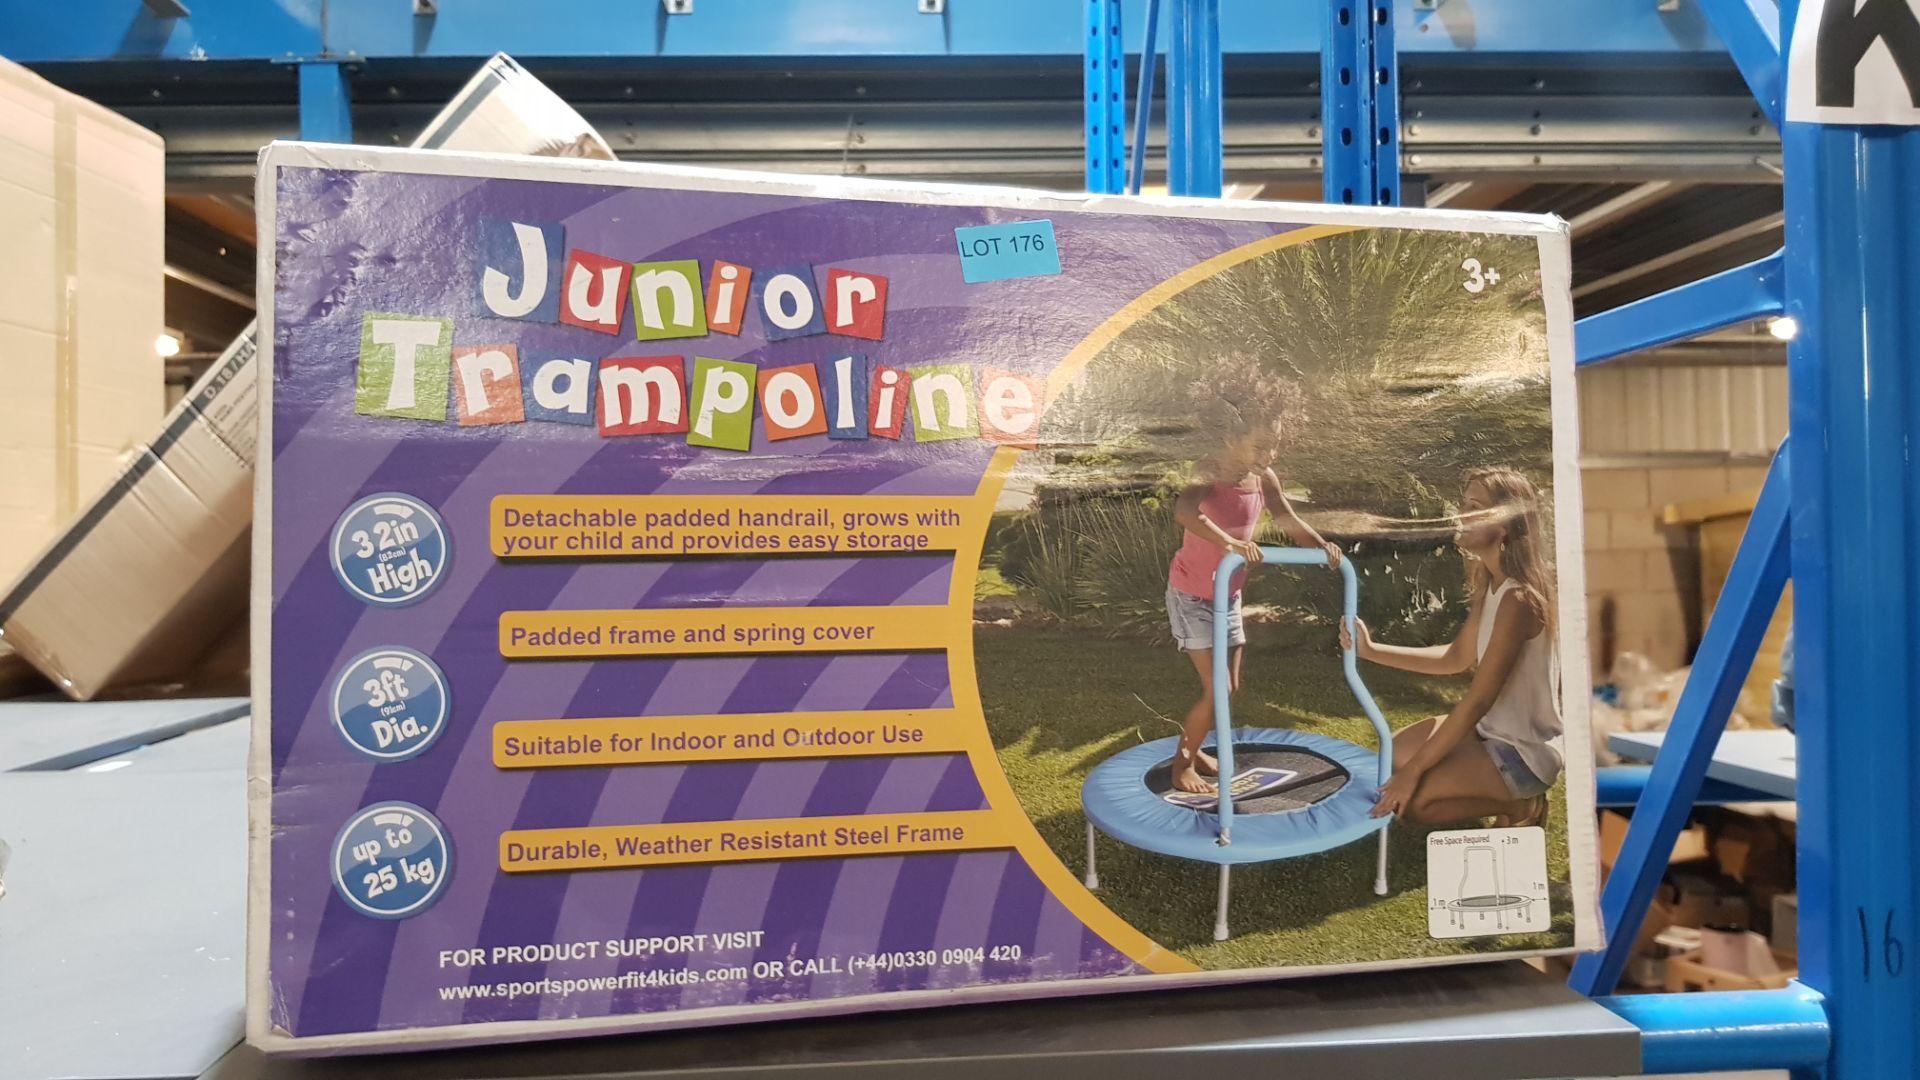 (2K) 1x Junior Trampoline Blue Ages 3+ - Image 2 of 2